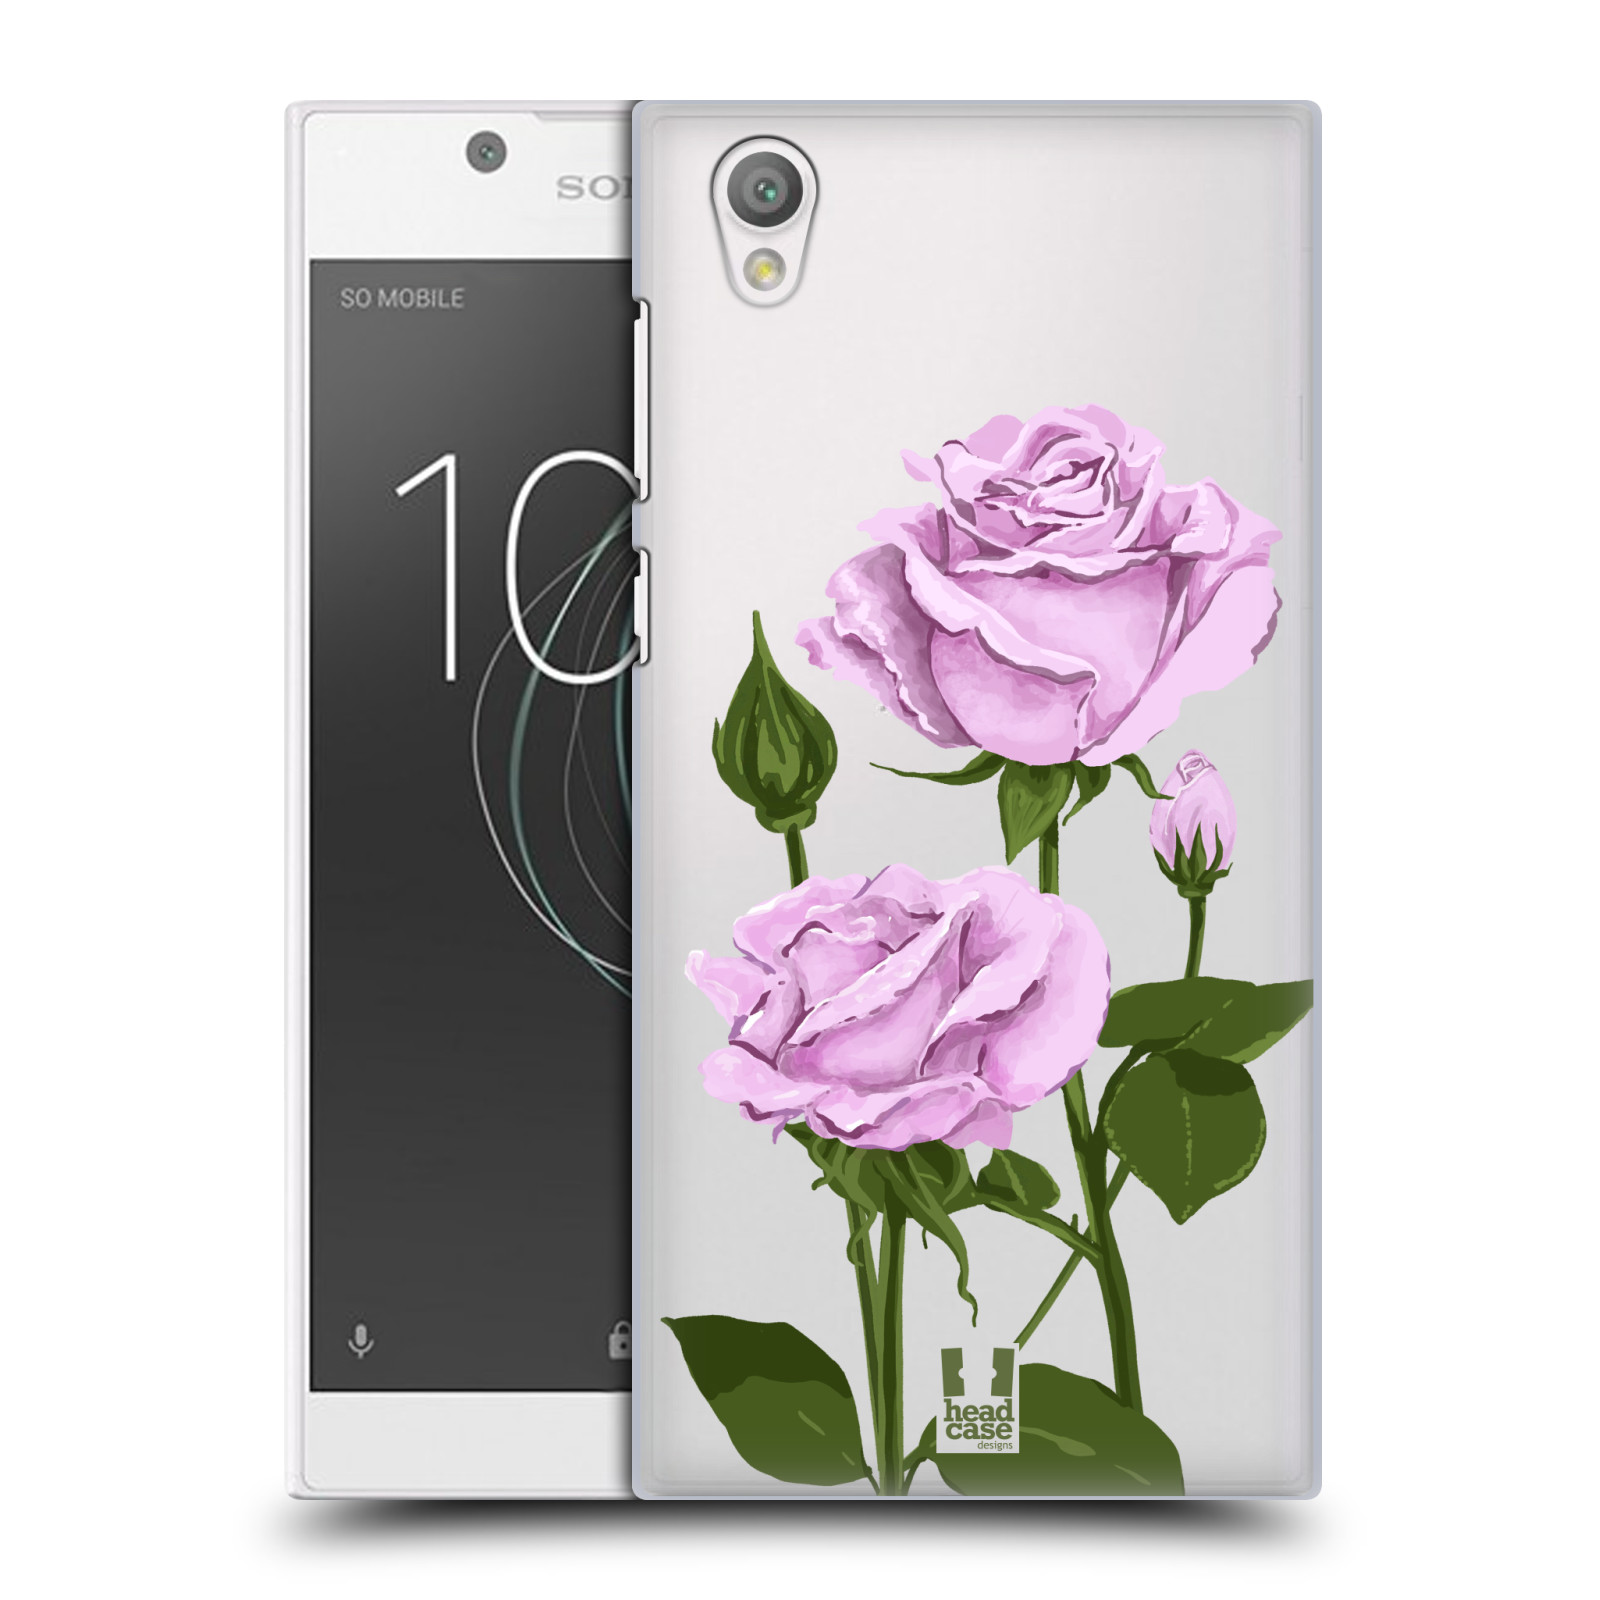 Pouzdro na mobil Sony Xperia L1 - HEAD CASE - květina růže růžová